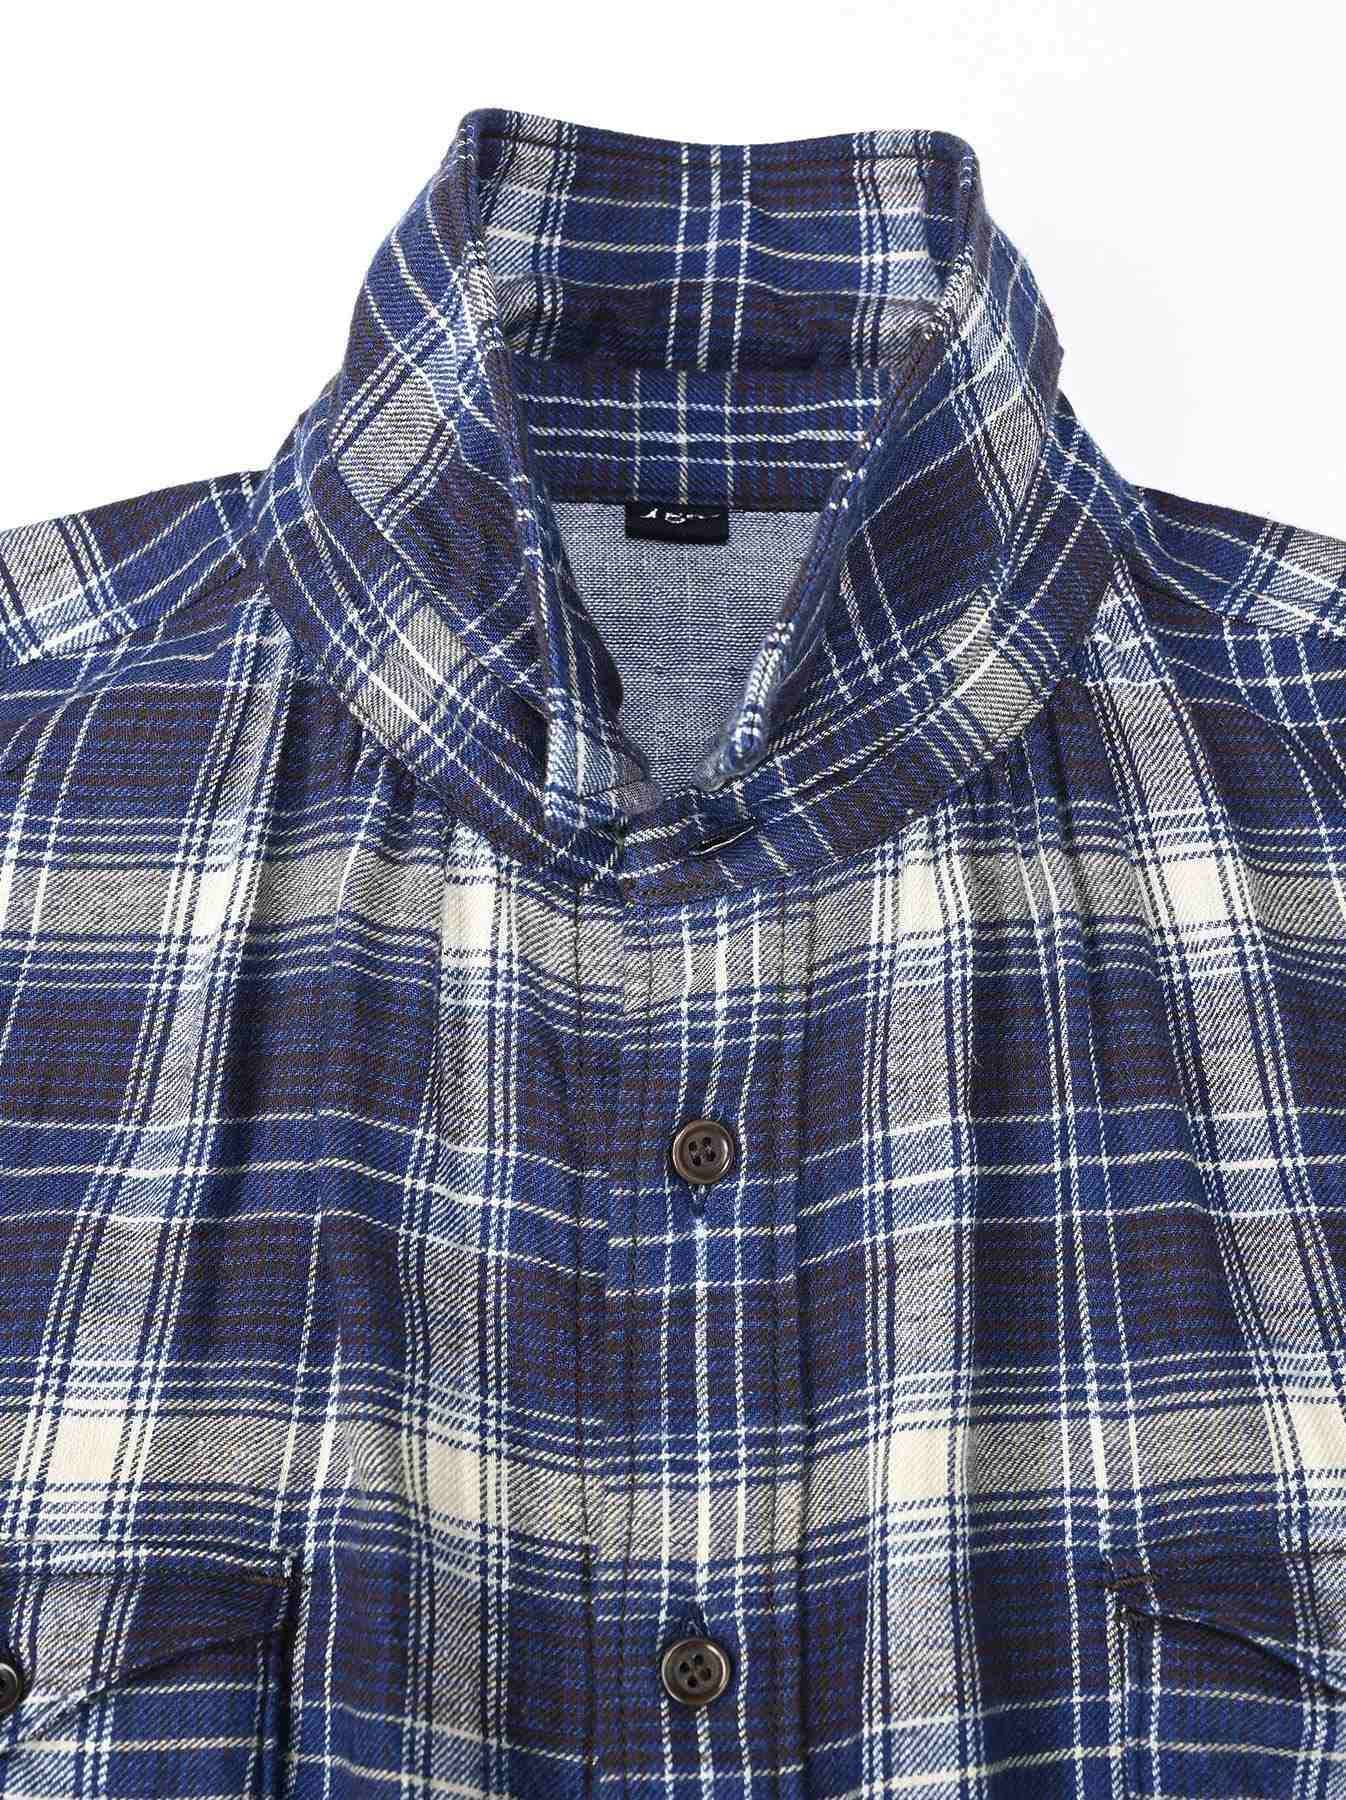 Indigo Twill Double Cloth Shirt Dress-7